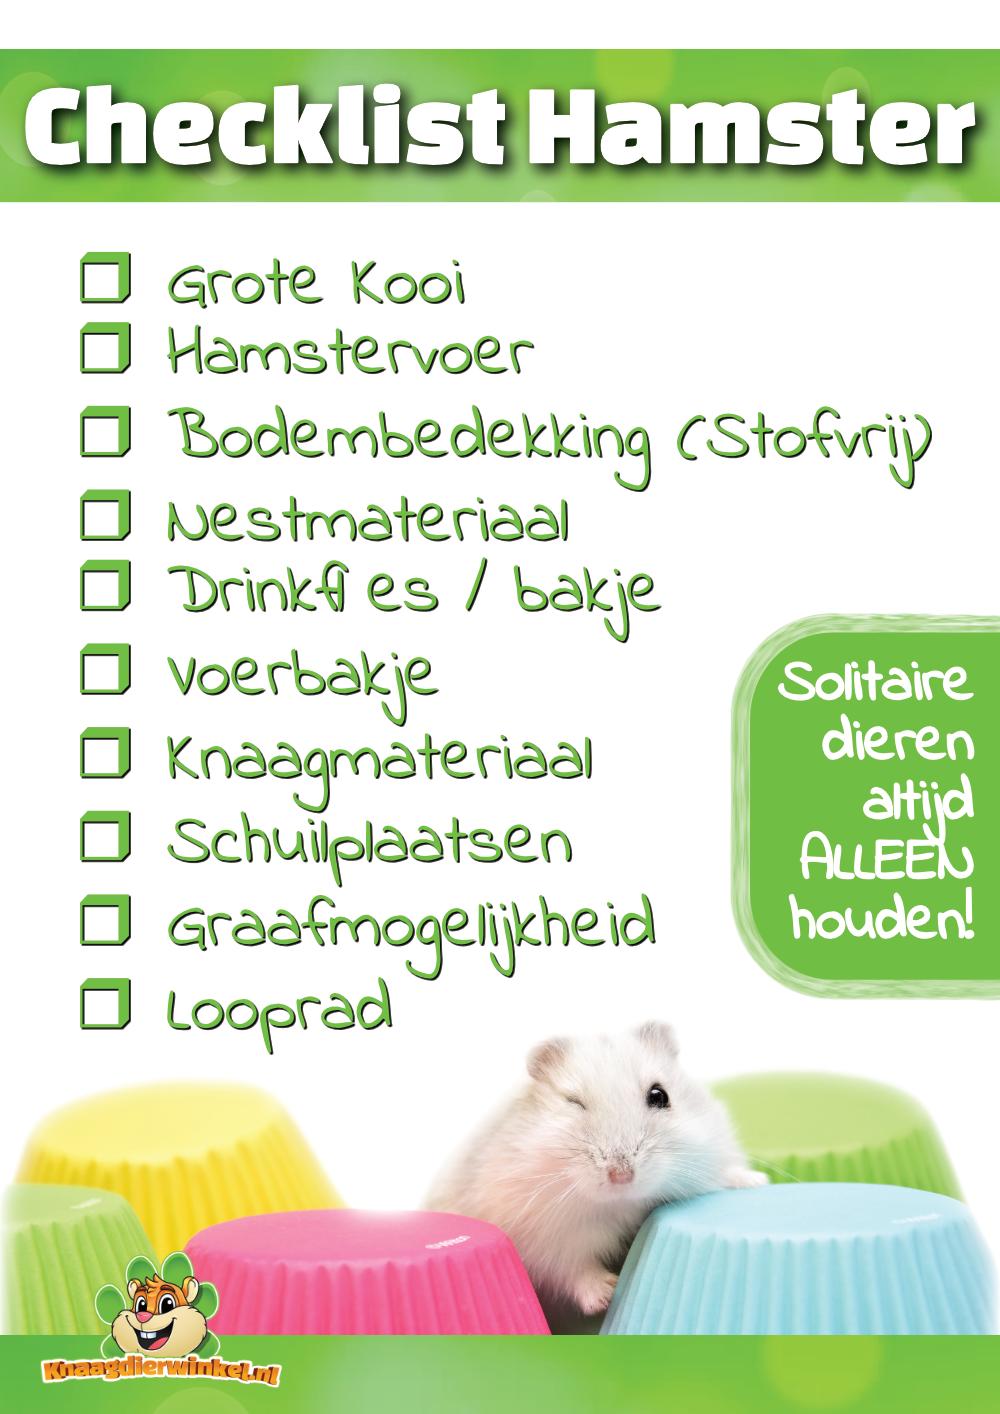 Checkliste Hamster